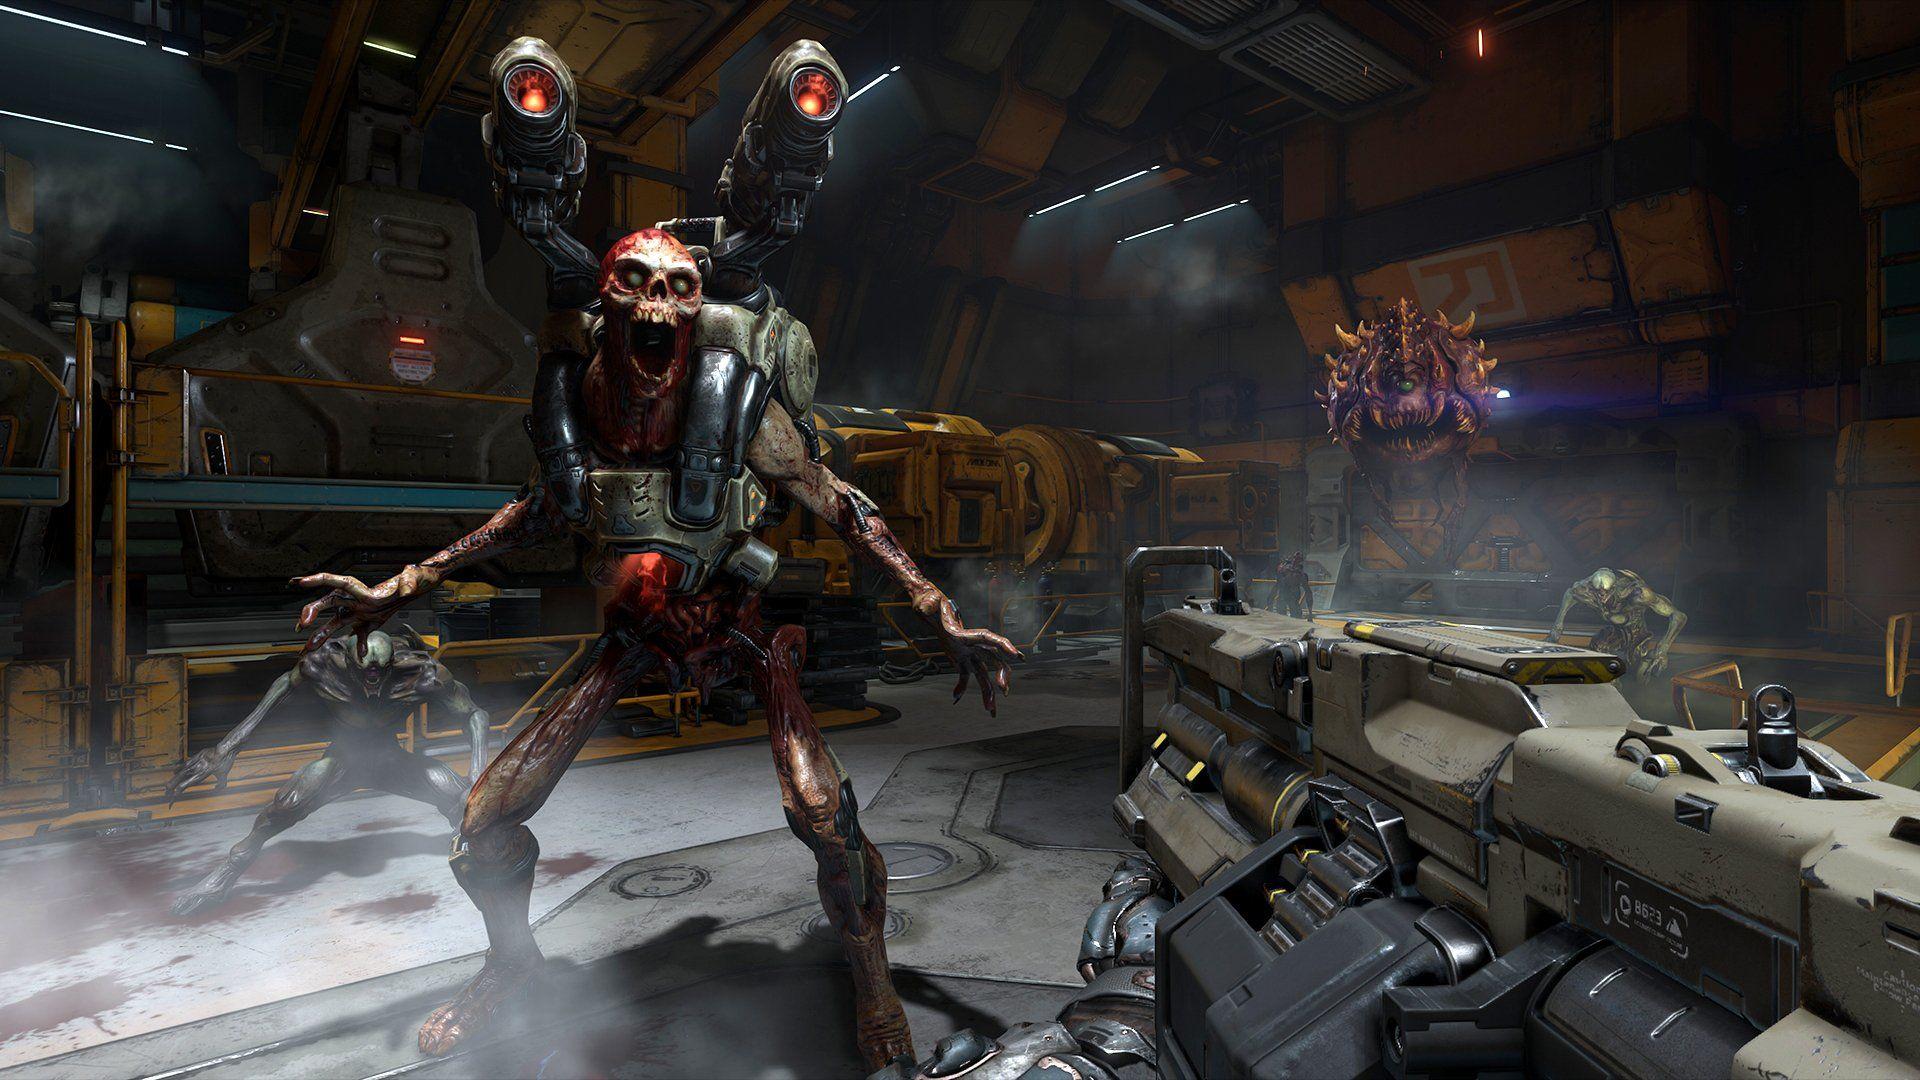 Doom Playstation 4 Doom Playstation Doom Xbox One Doom